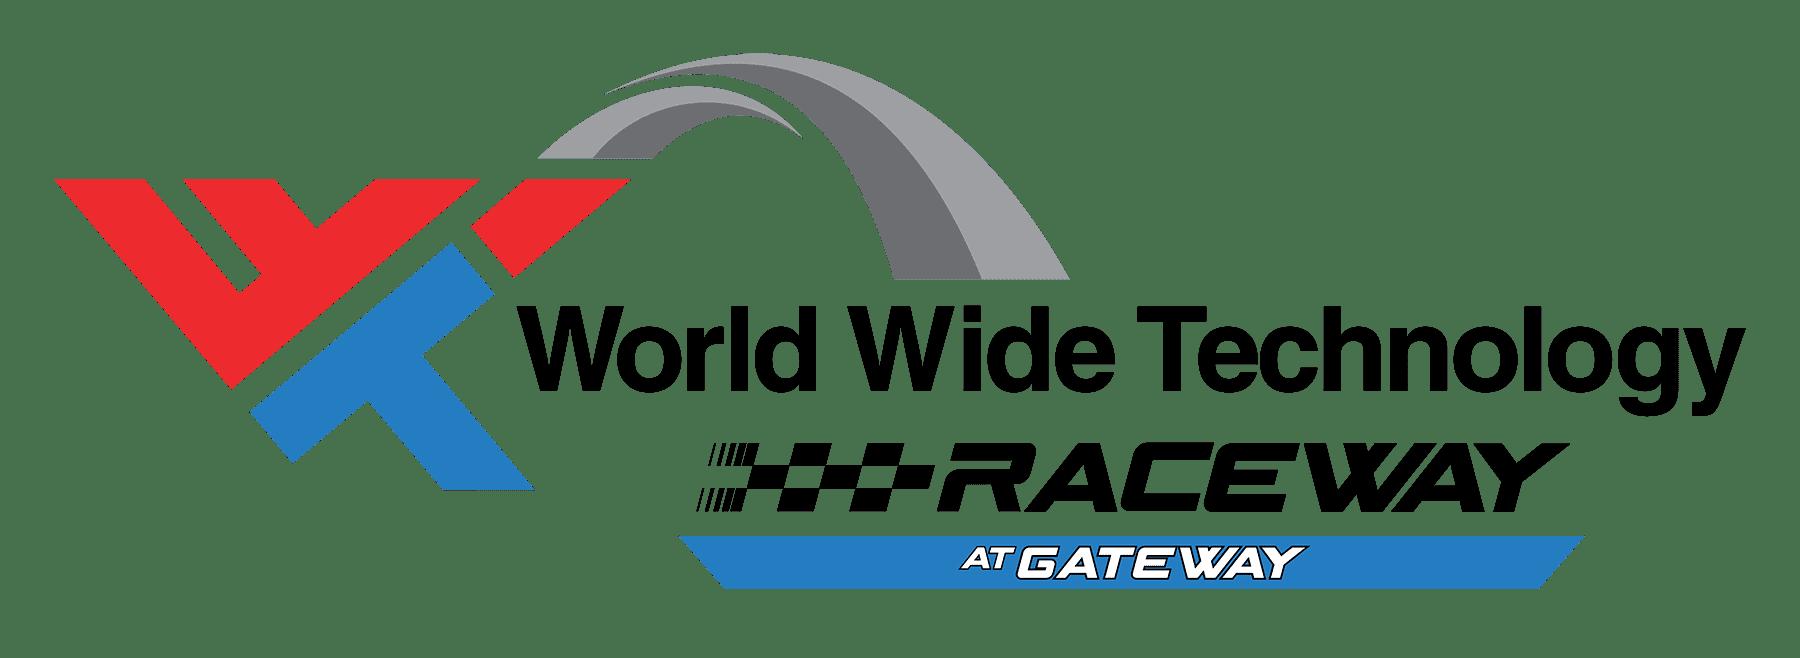 World Wide Technology Gateway logo for media.